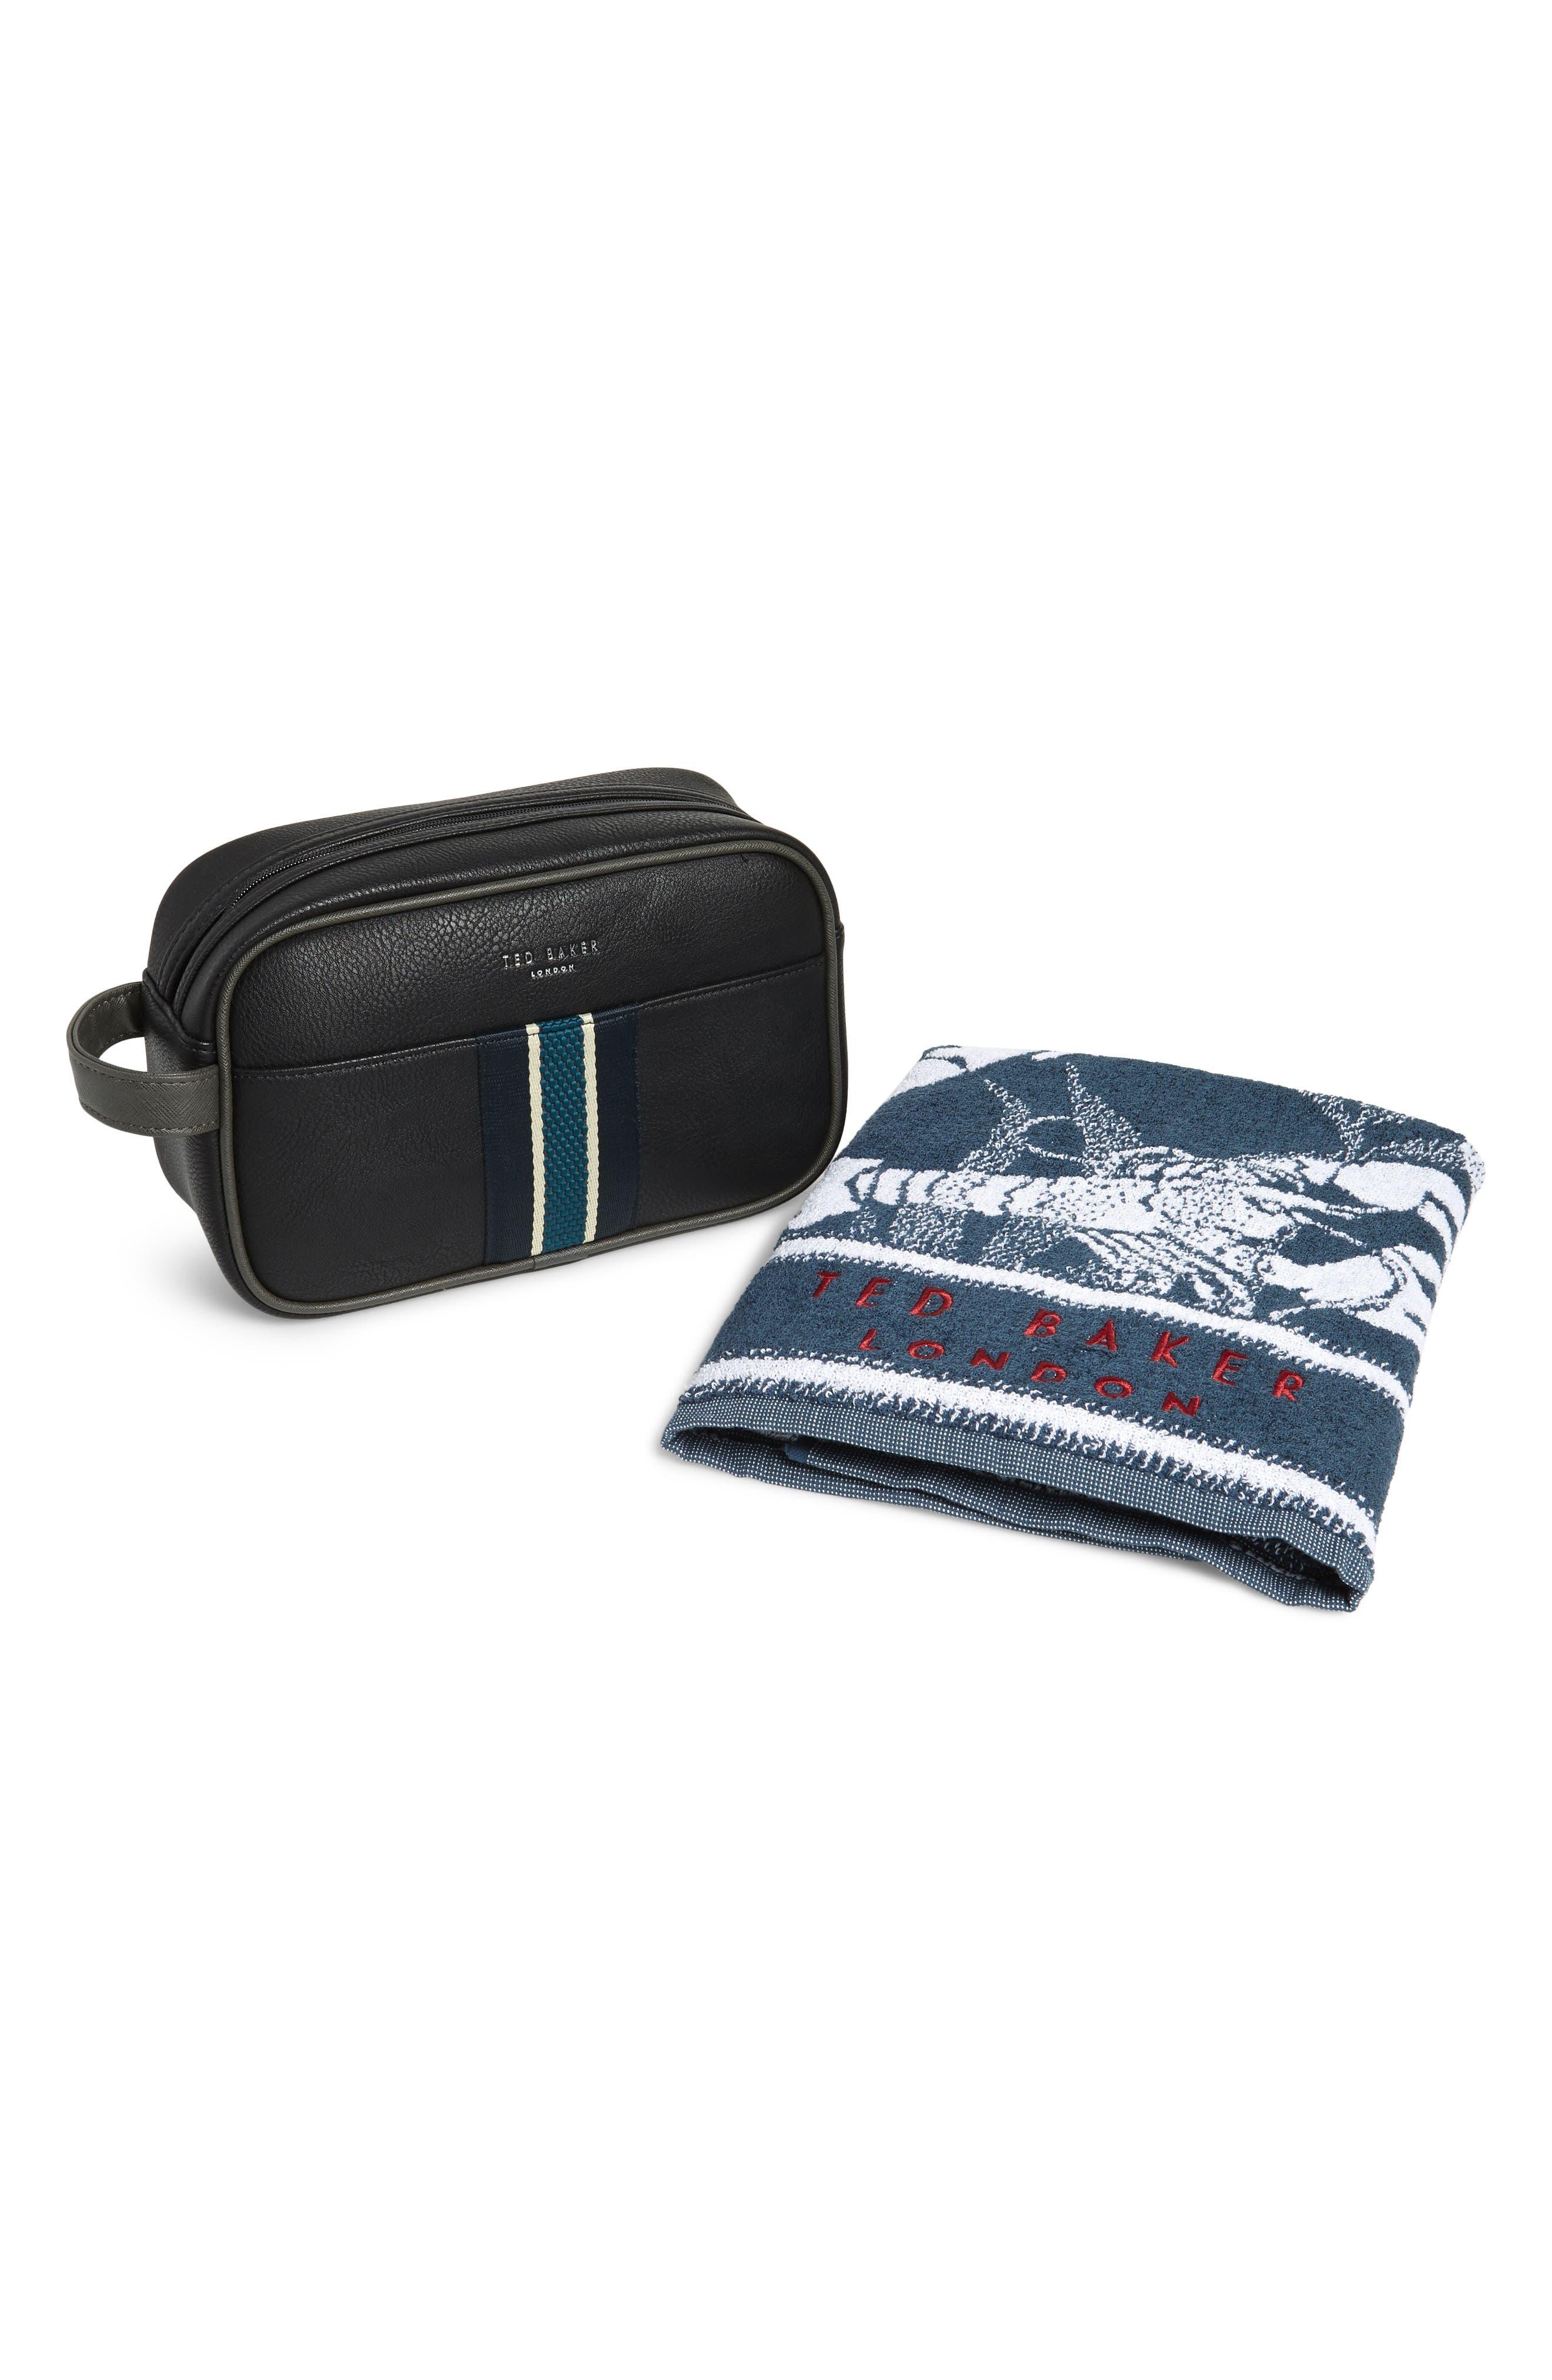 Travel Kit & Towel,                         Main,                         color, BLACK